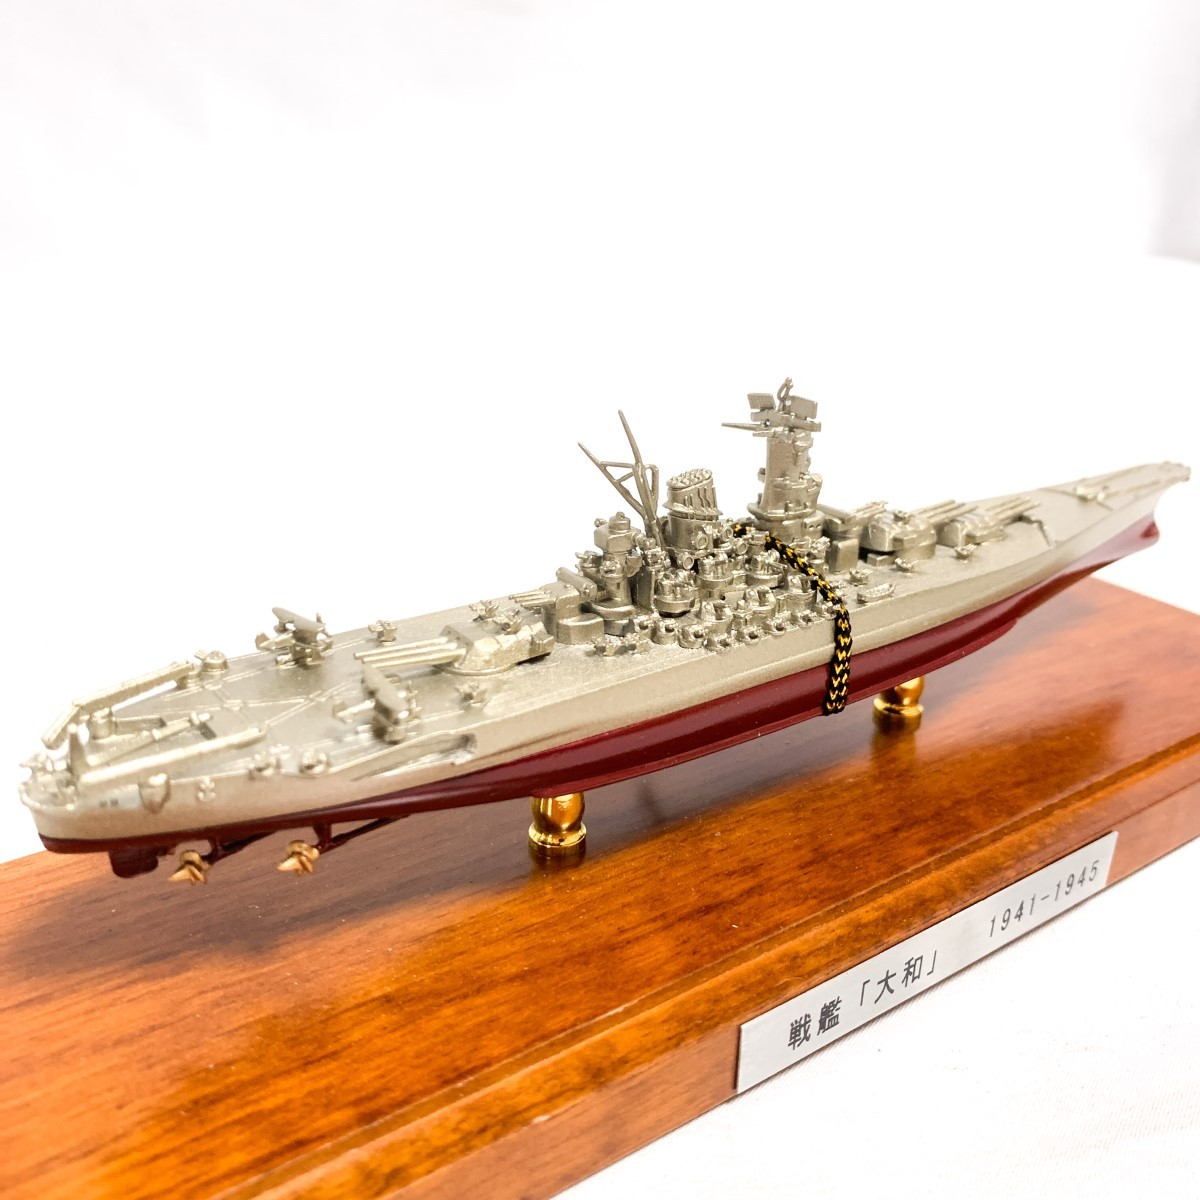 KONISHI 戦艦「大和」1941-1945 小西製作所 完成品 船 模型 置物 インテリア F226